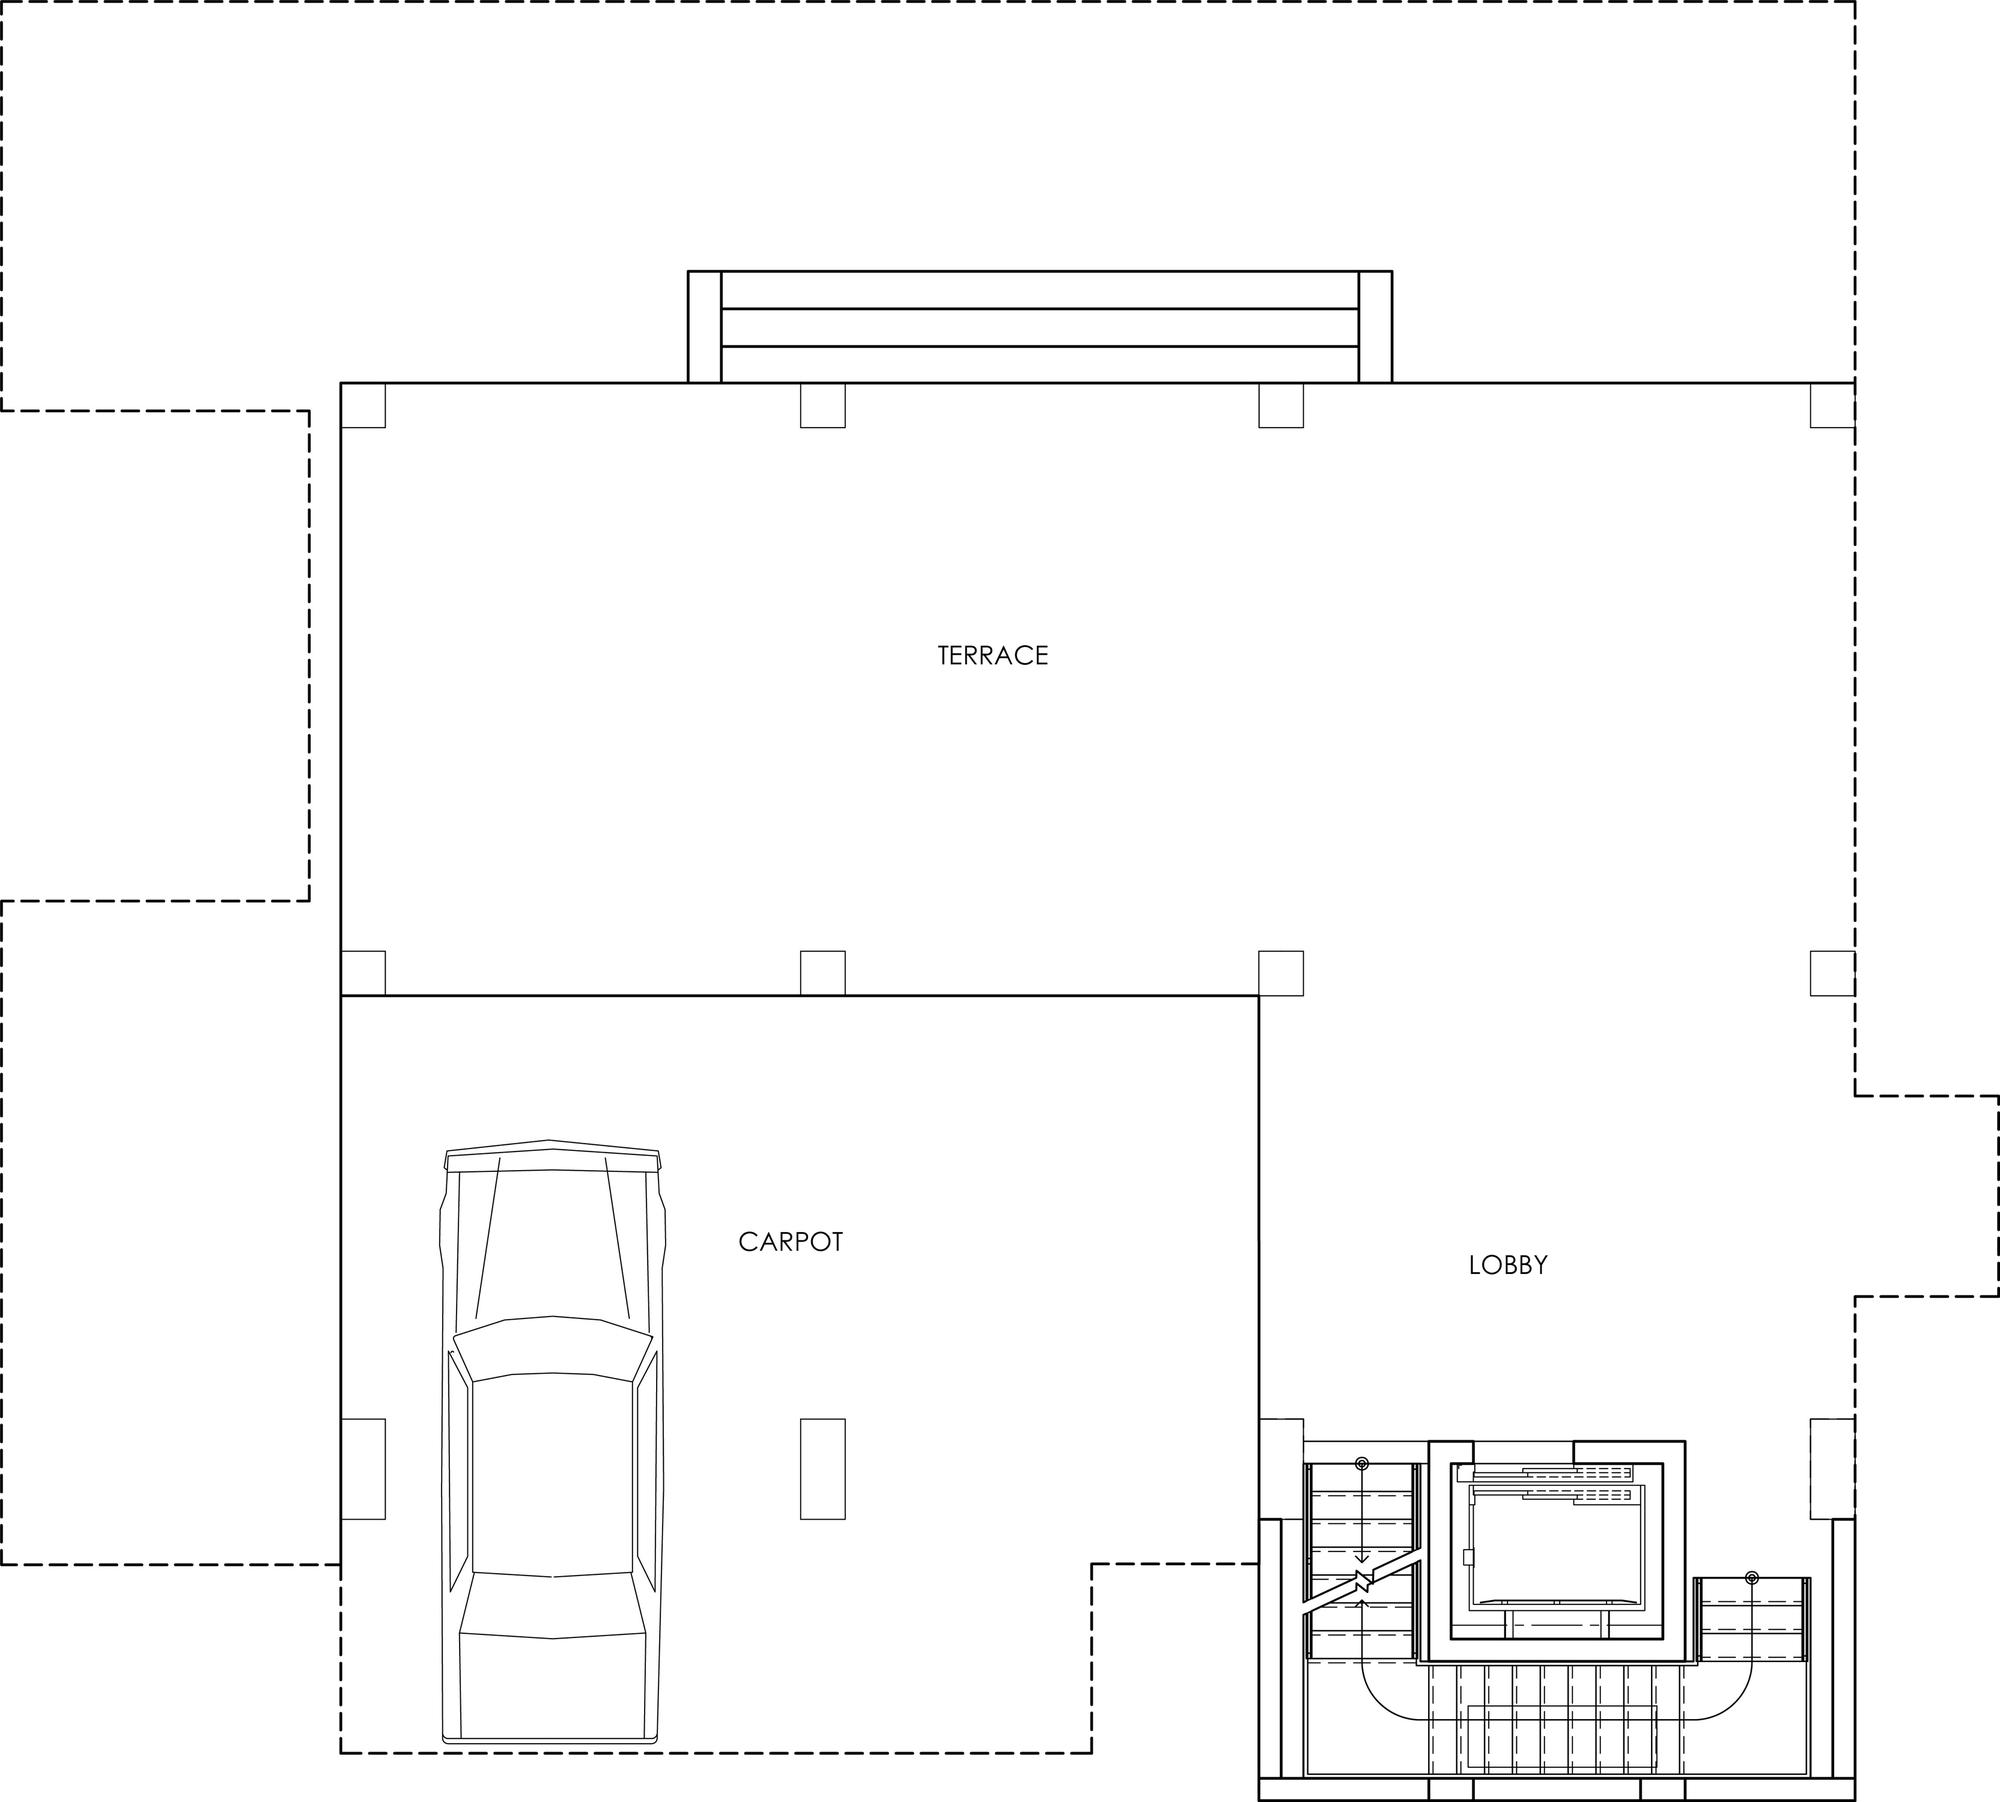 residencia-tavernier-drive-luis-pons-design-lab_101-house_renovation_-_tavernier_key_fl-_first_floor_plan